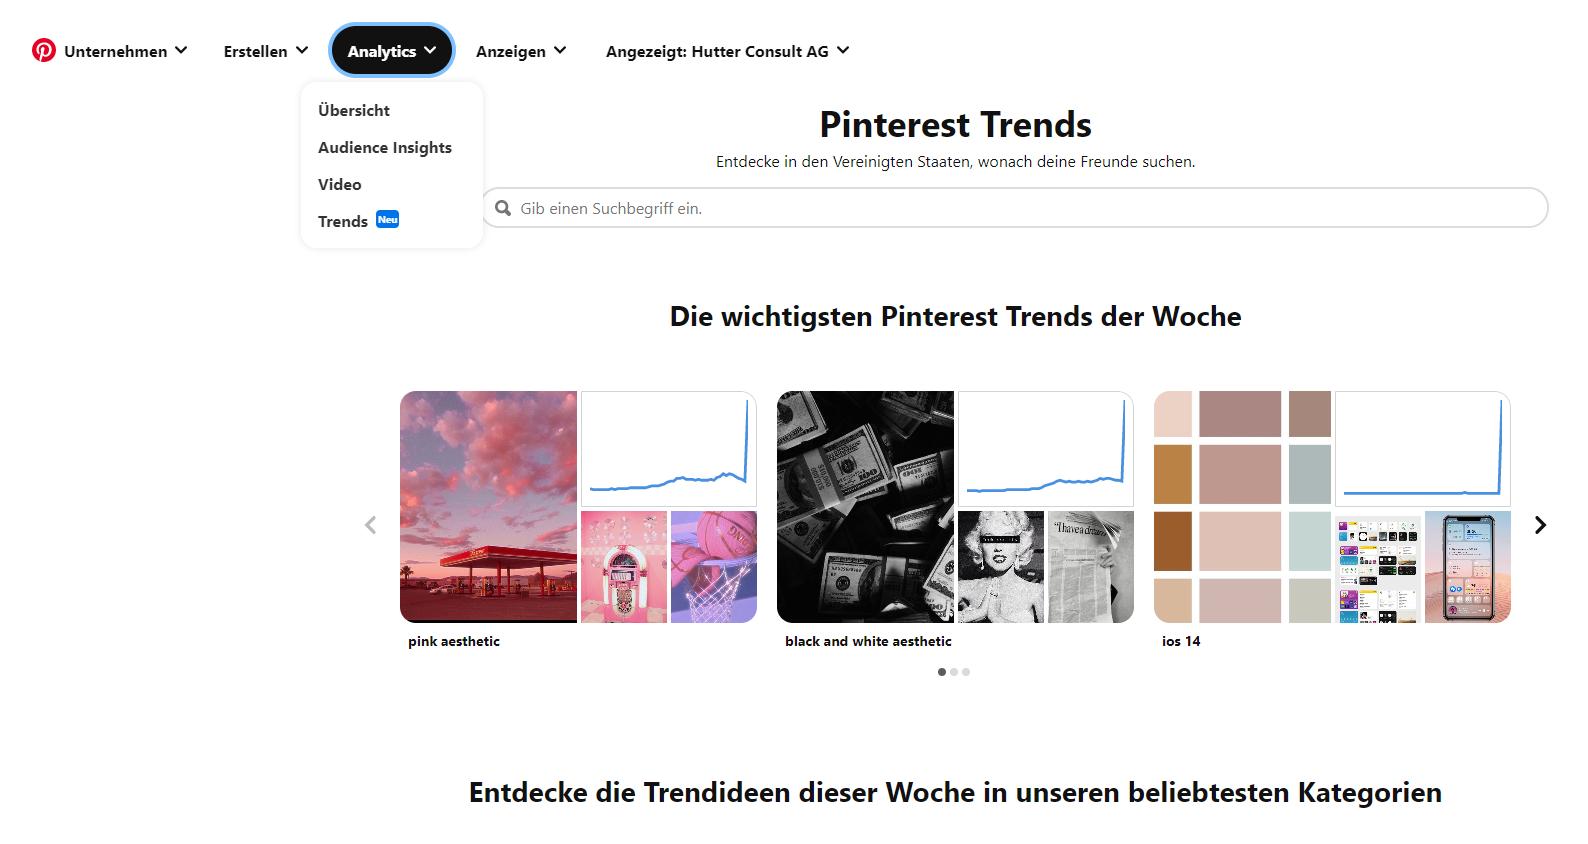 Pinterest Trends